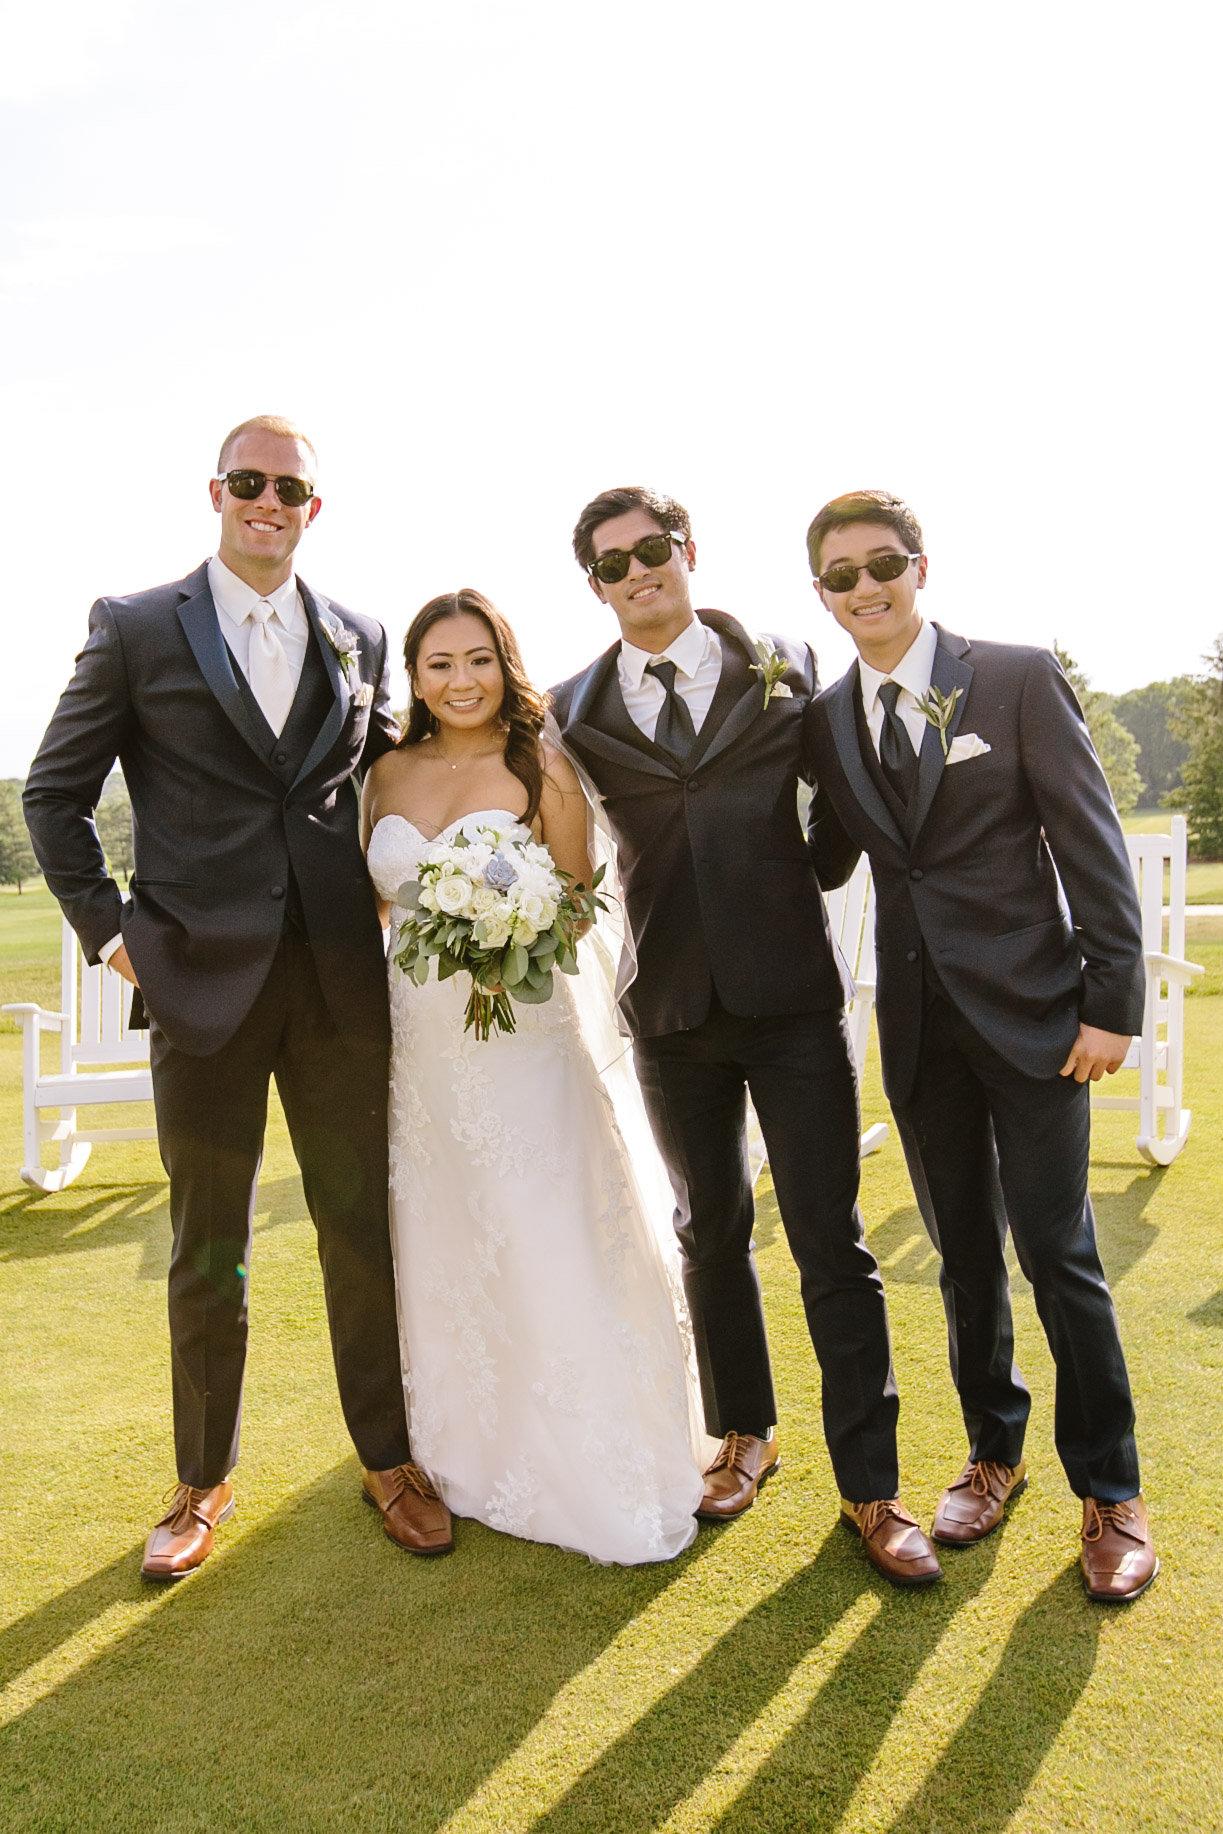 07 - Bridal Party-0693.jpg